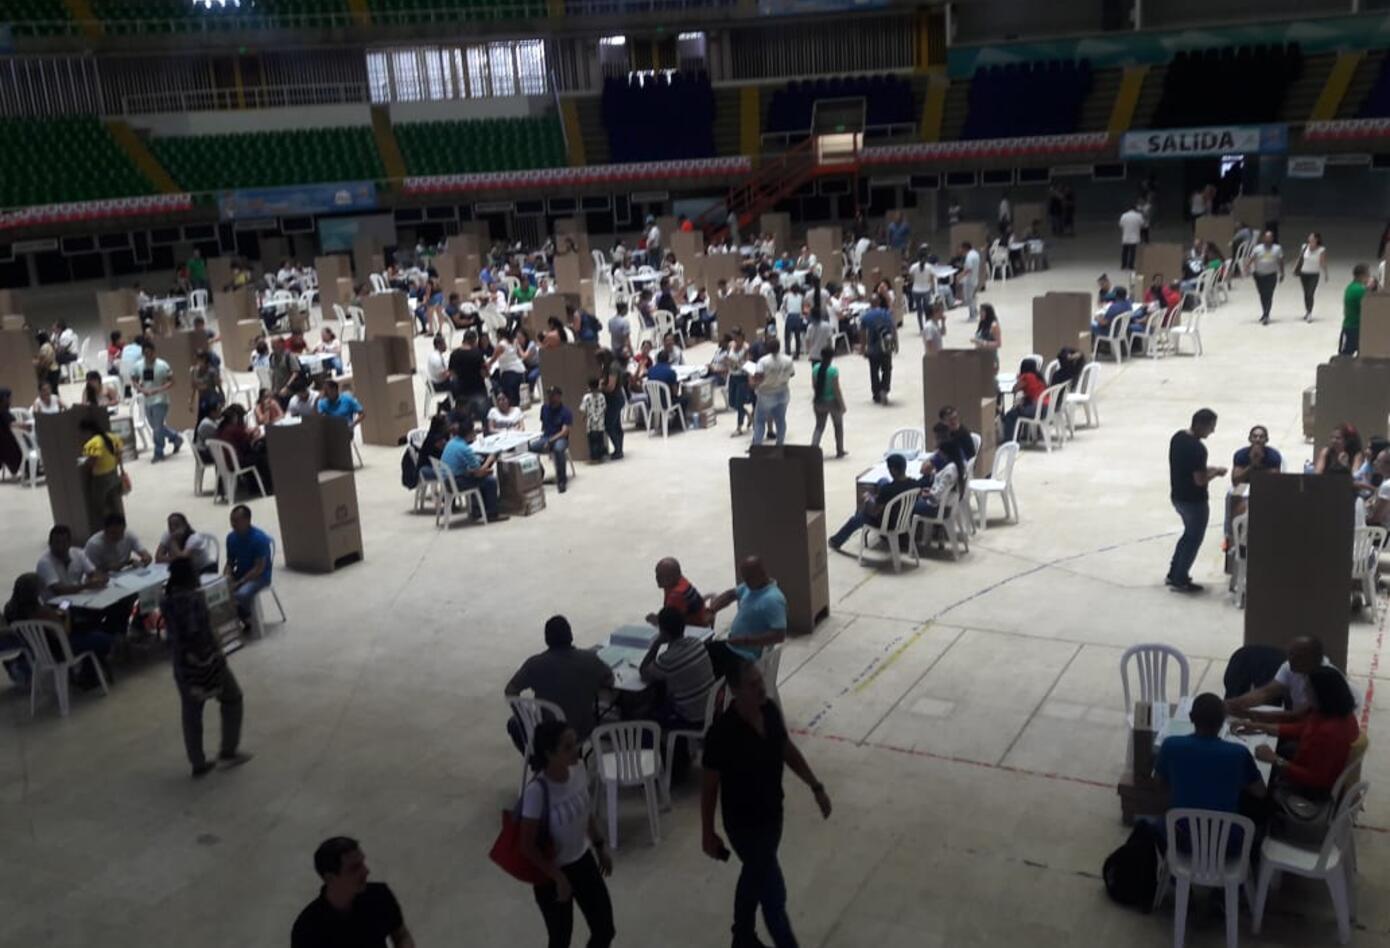 CONSULTA ANTICORRUPCIÓN EN CÚCUTA